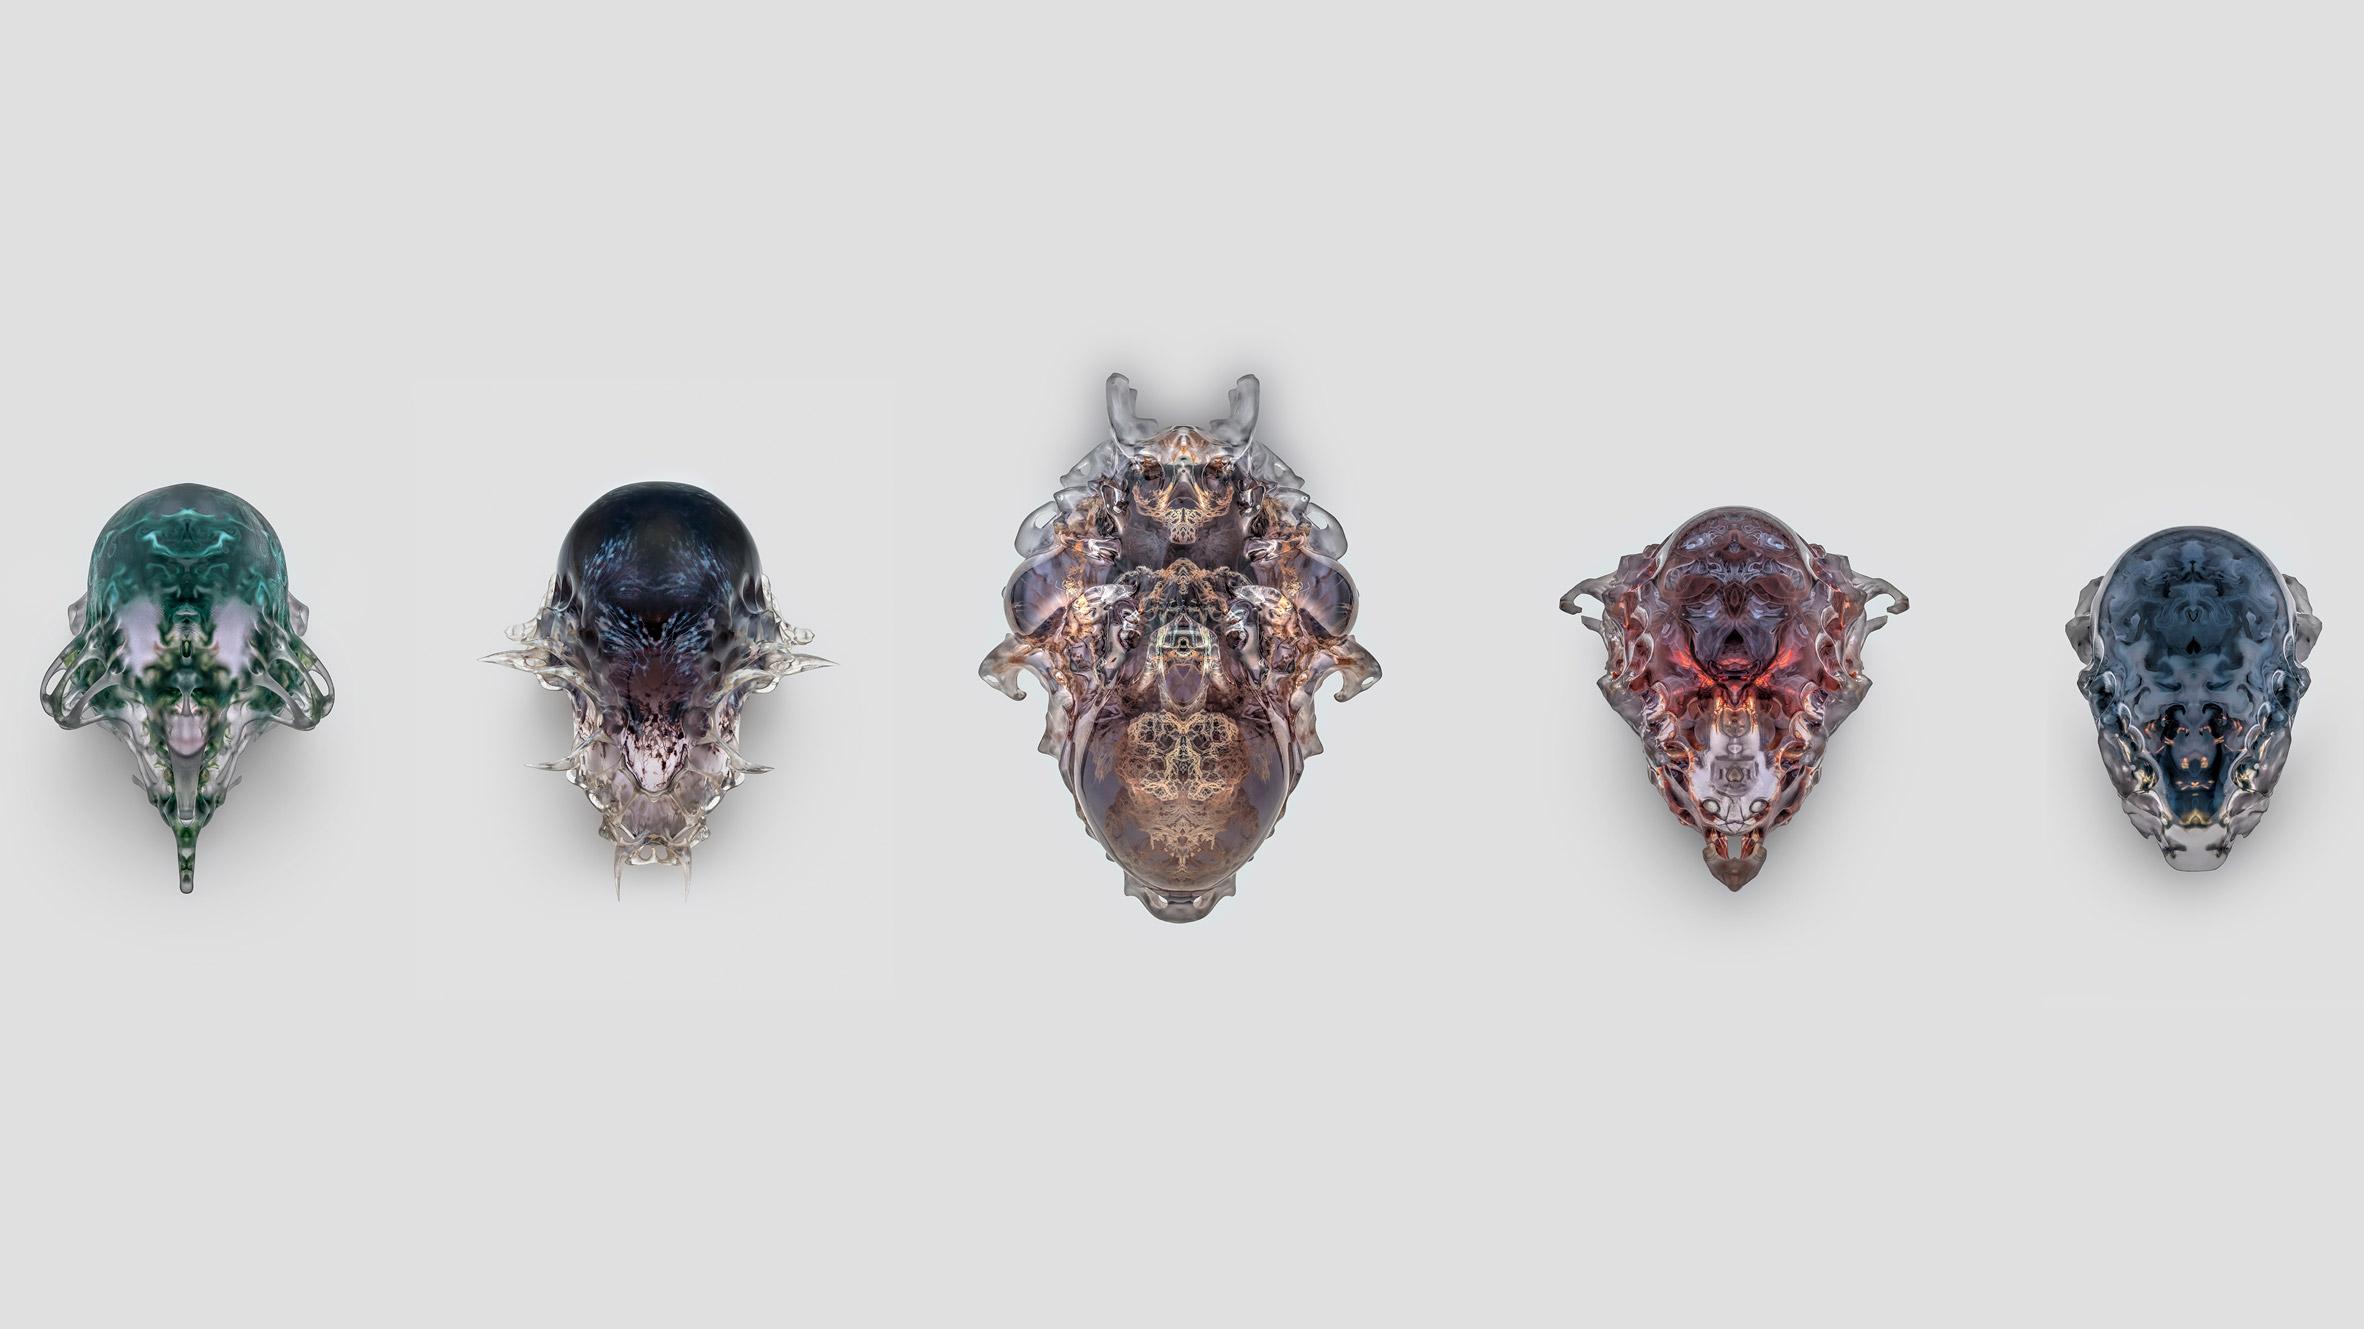 vespers-neri-oxman-3d-printed-death-masks-mediated-matter-group_dezeen_hero